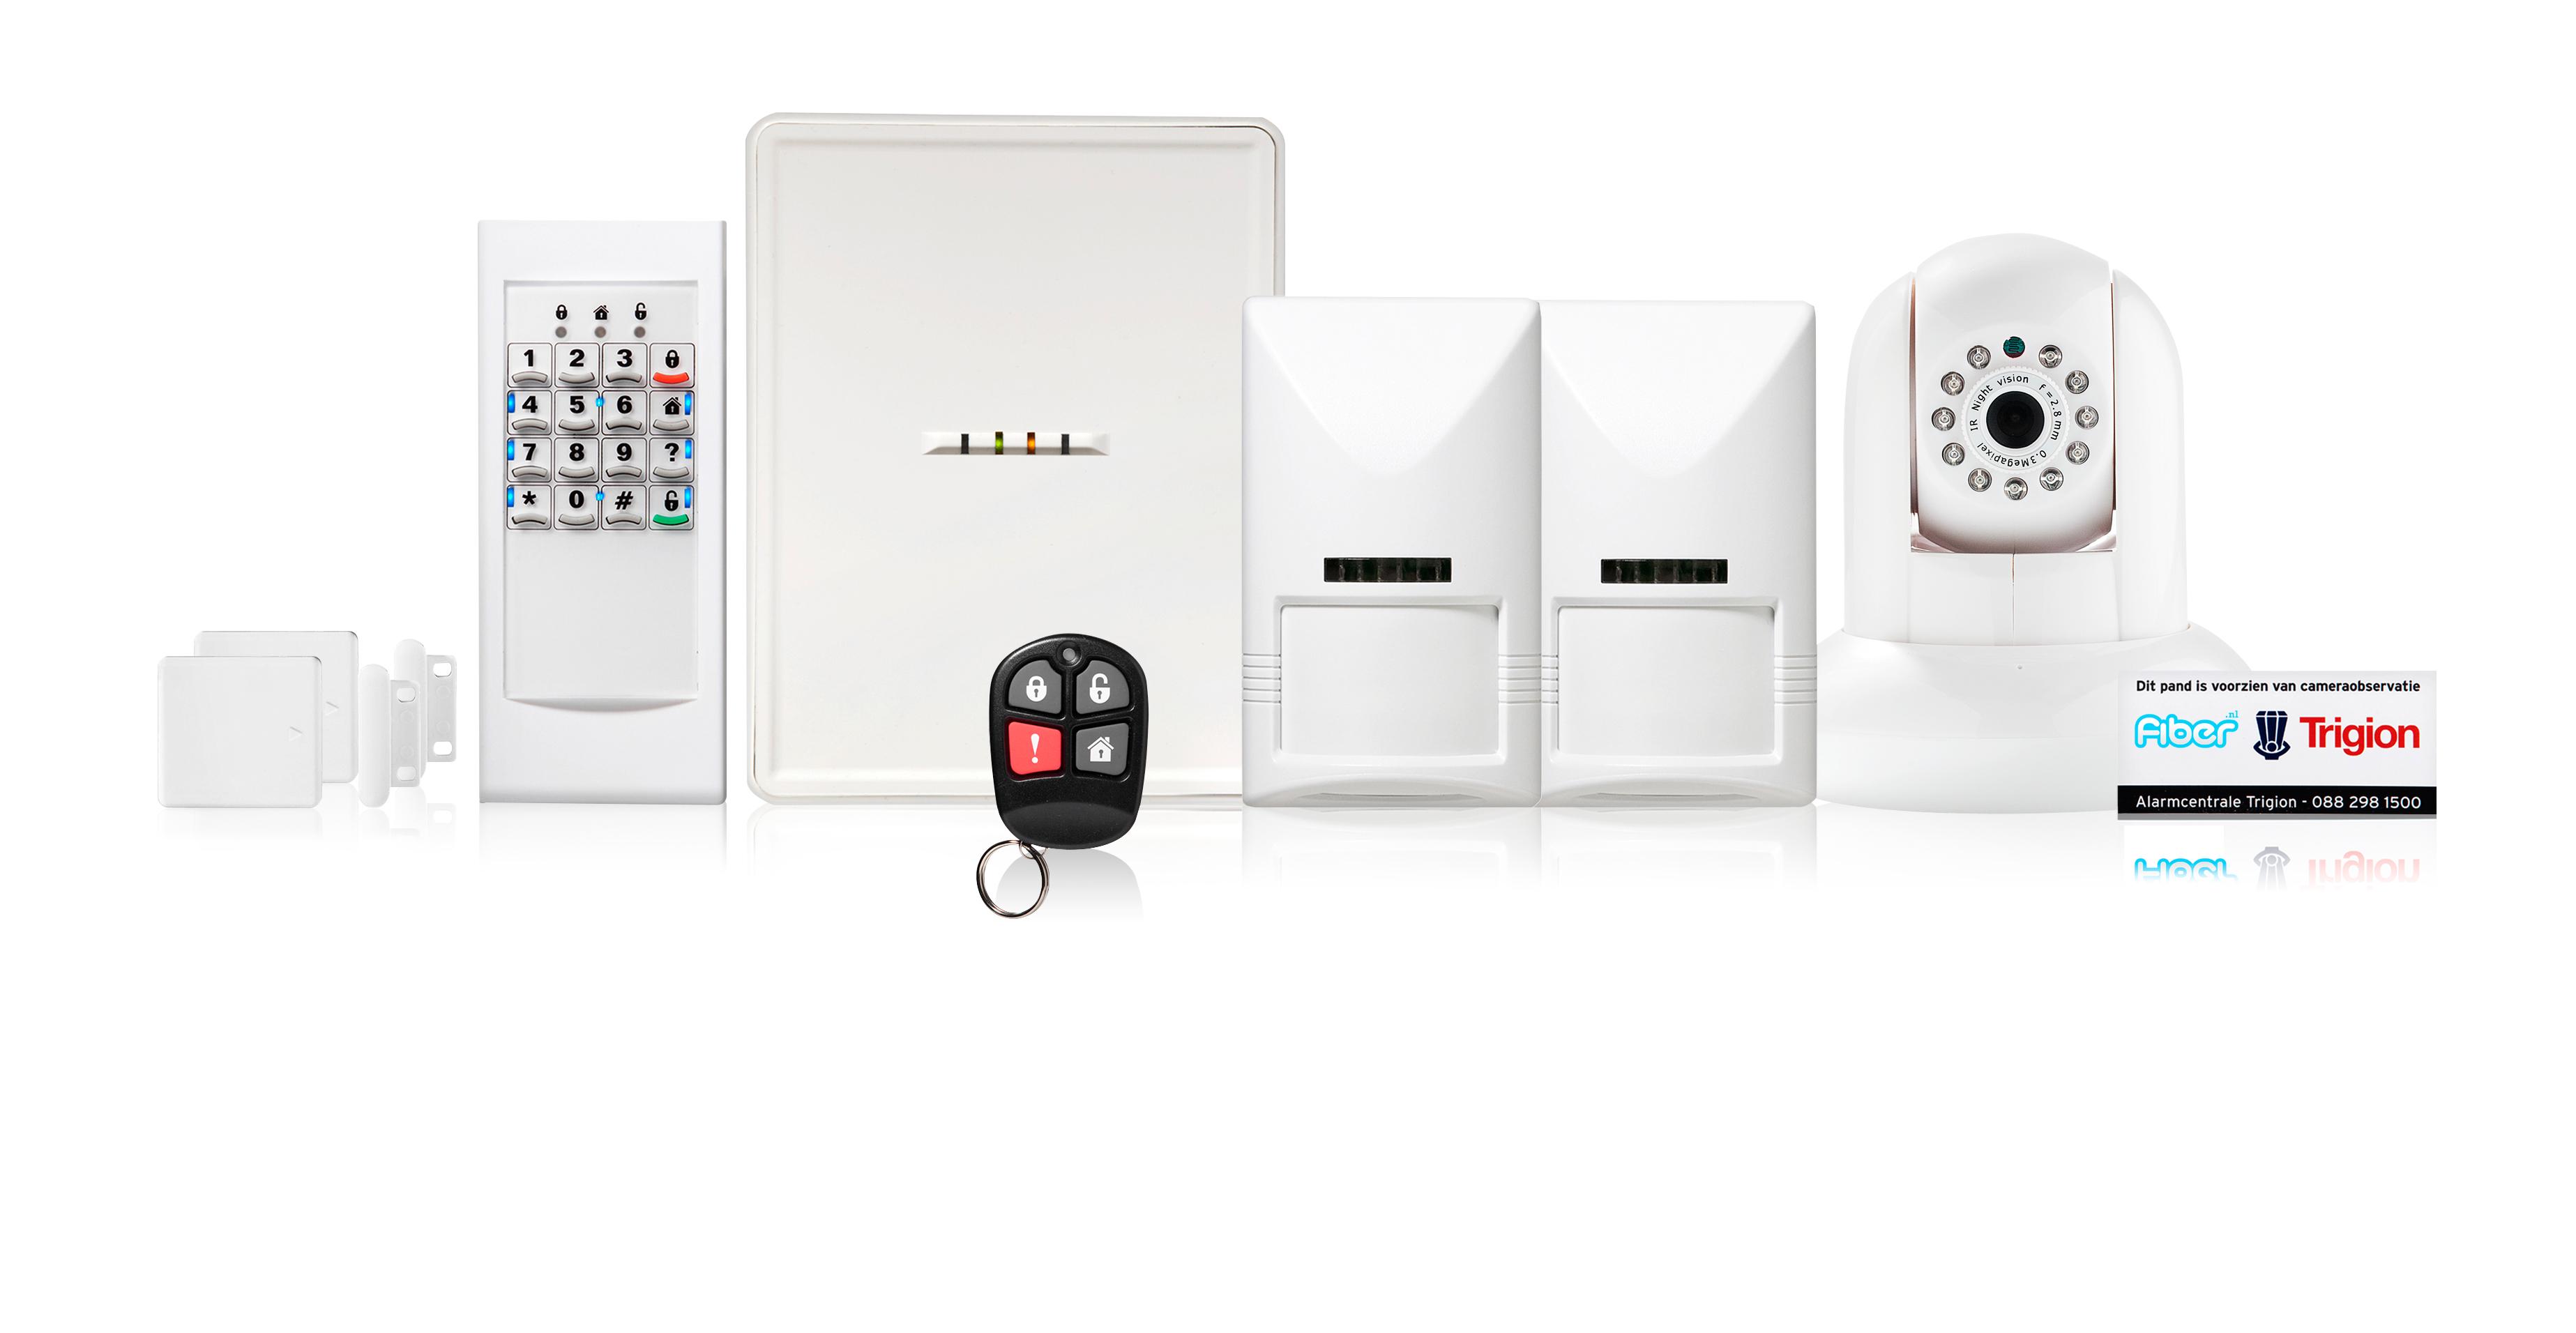 Smartalarm-accessoires